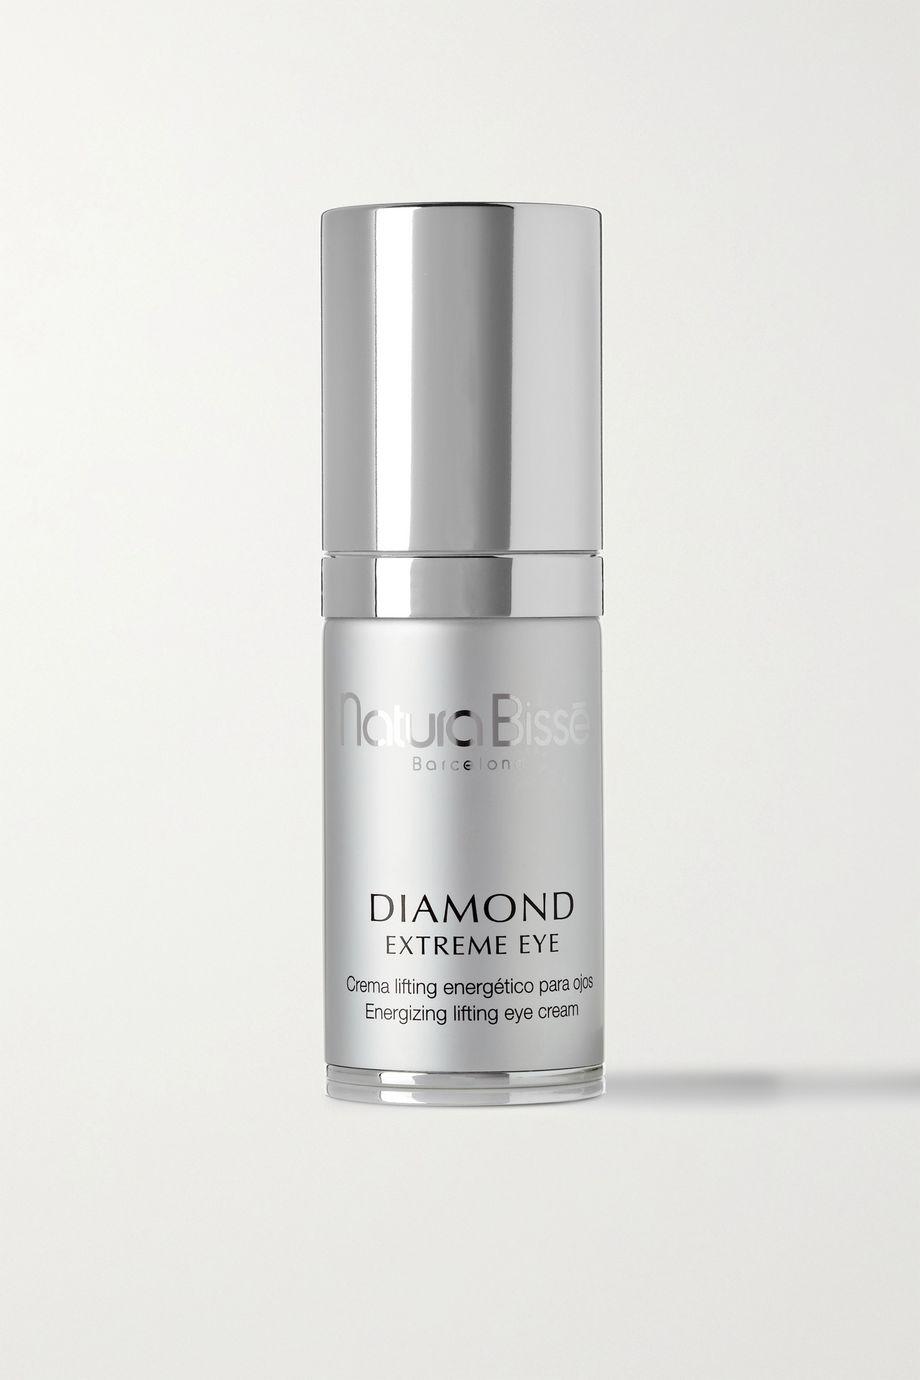 Natura Bissé Diamond Extreme Eye, 25ml